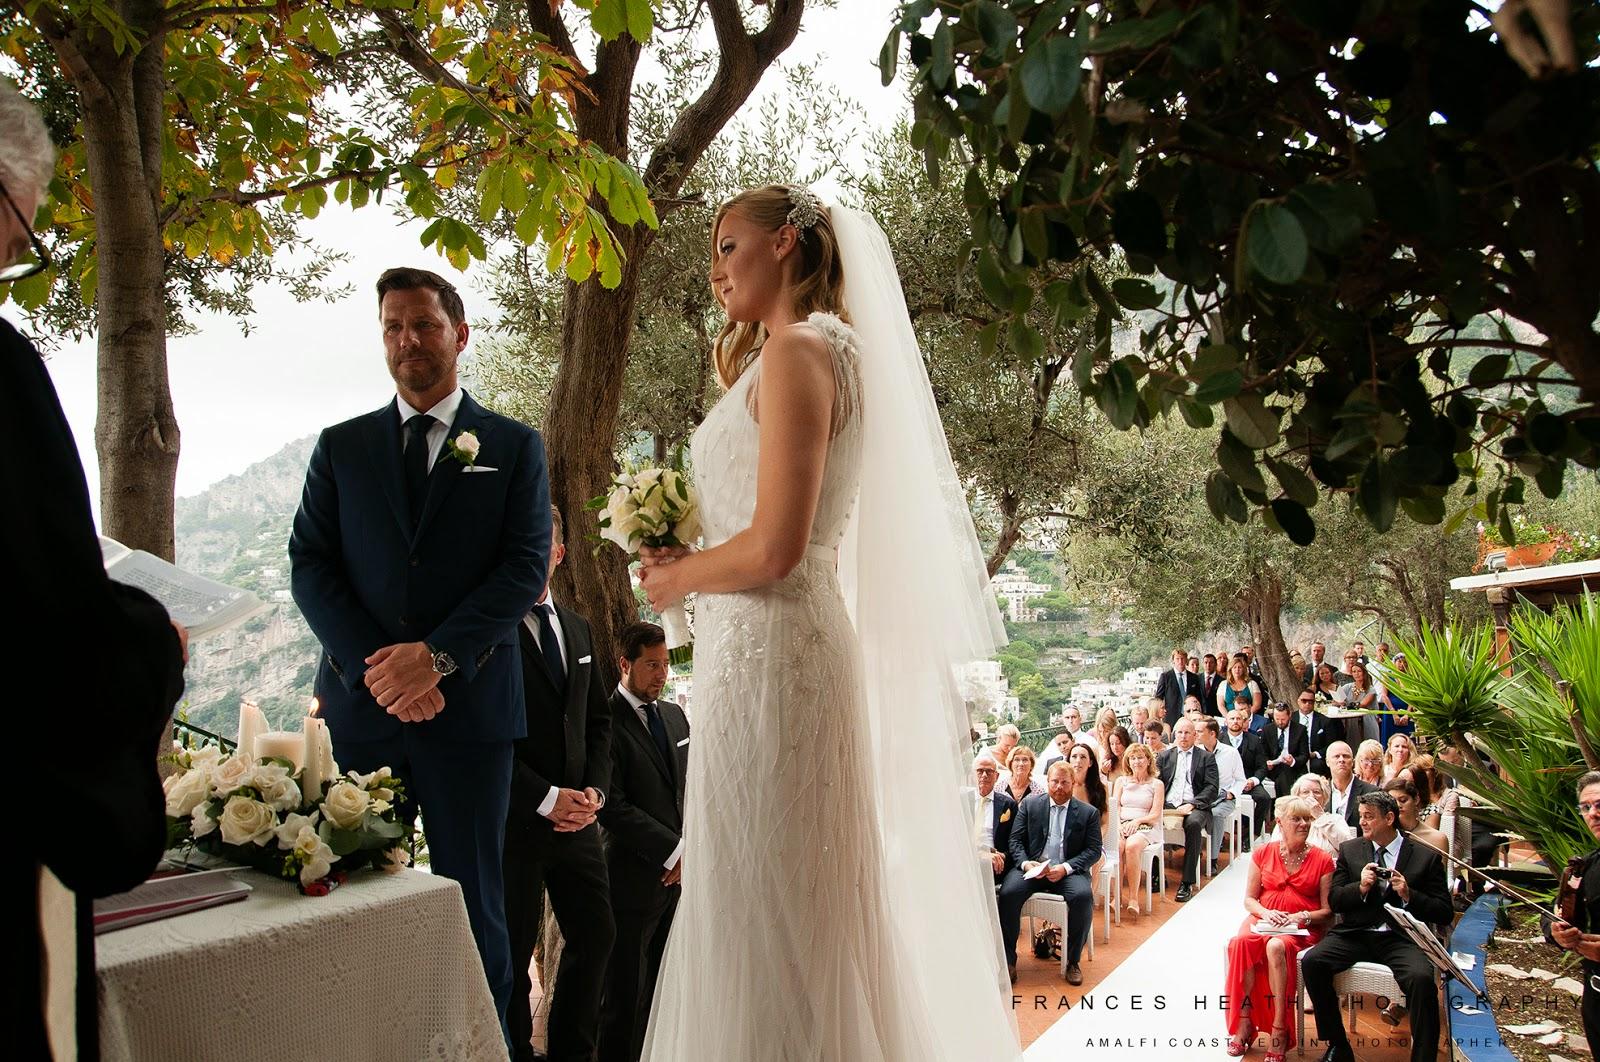 Bride and groom celebrating their wedding at Villa Oliviero